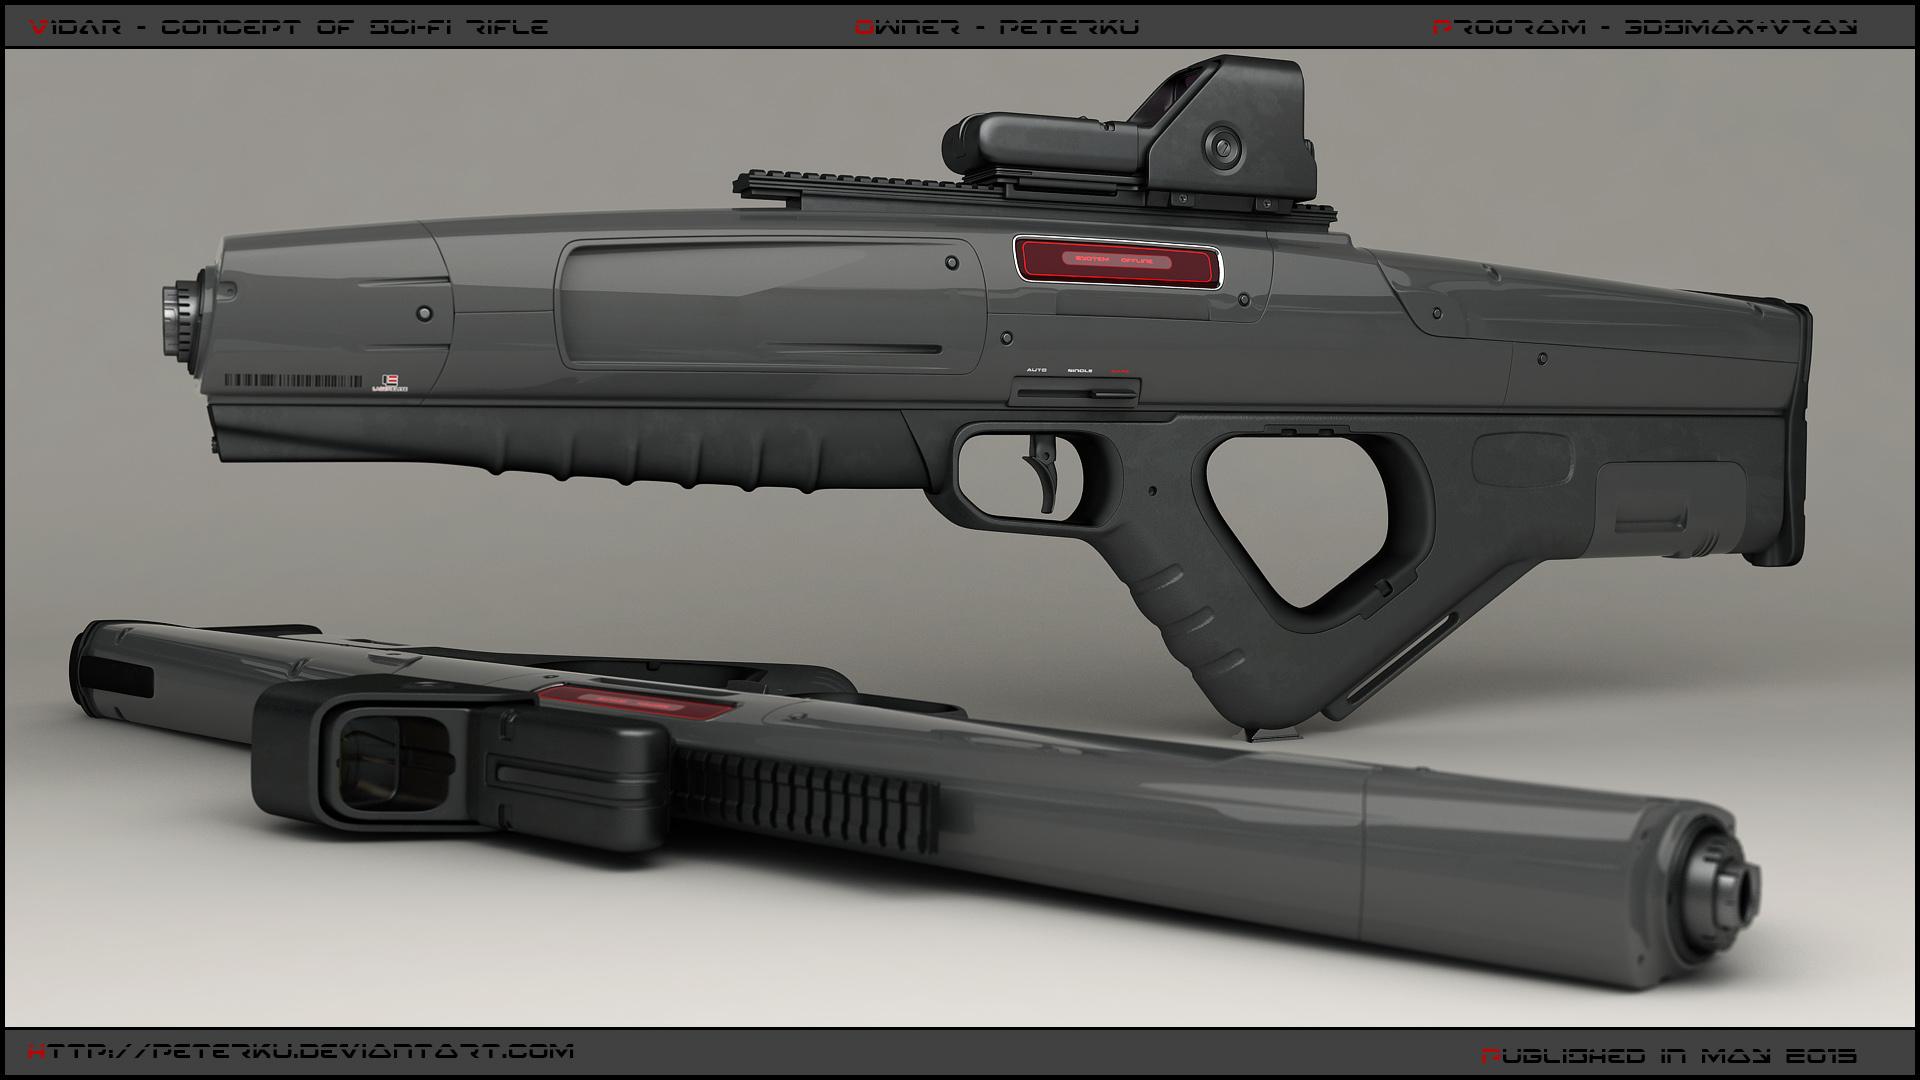 Vidar-rifle-main by peterku